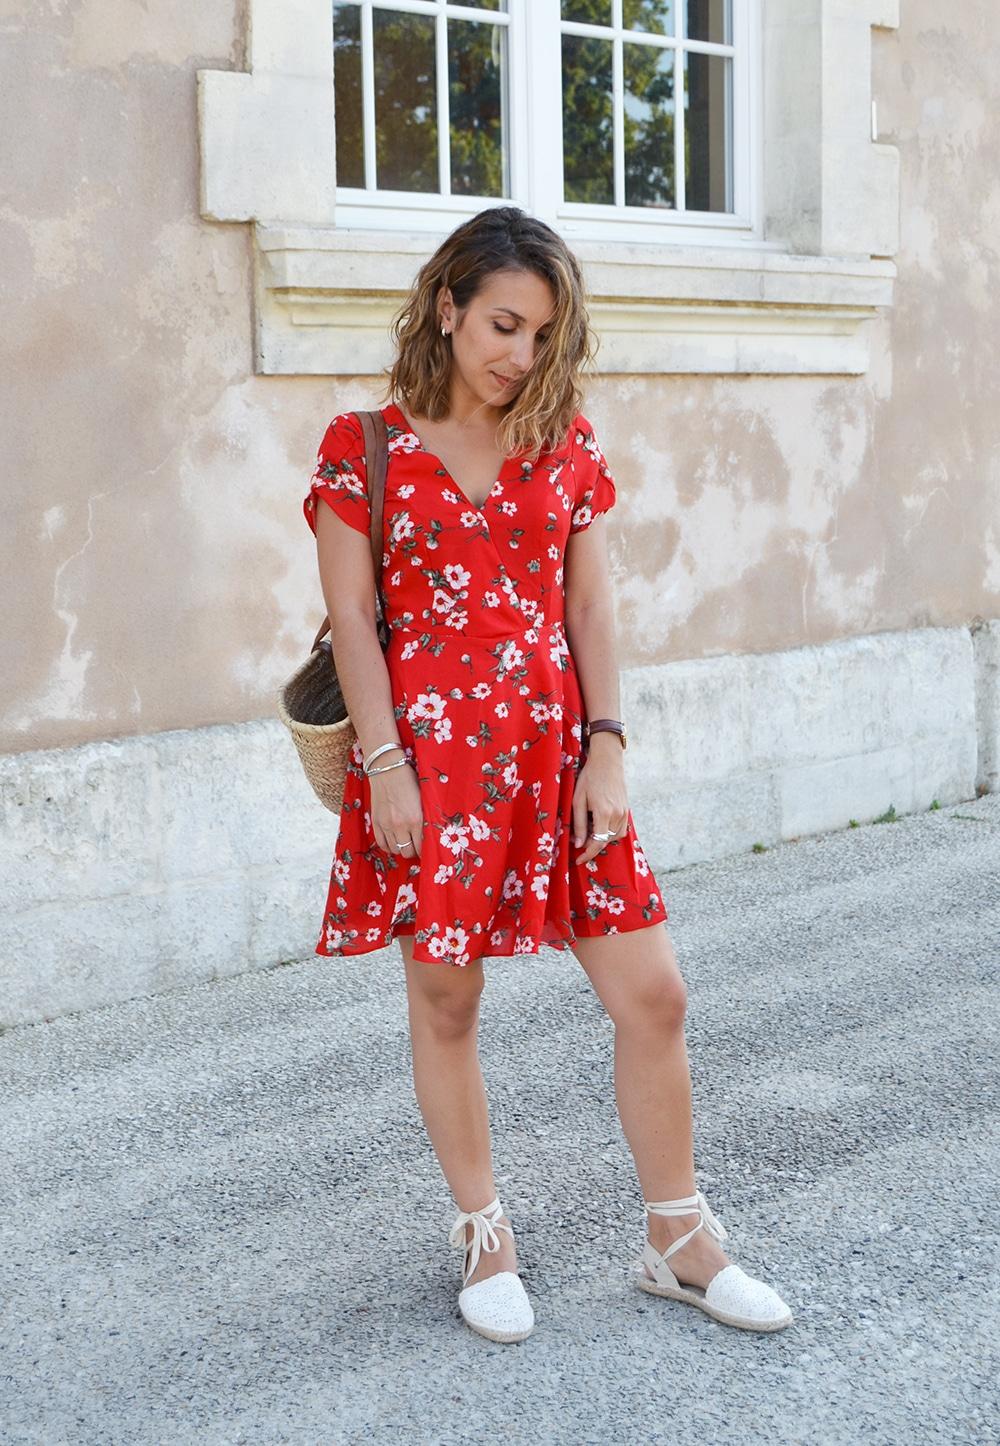 robe croisée shein rouge fleurs